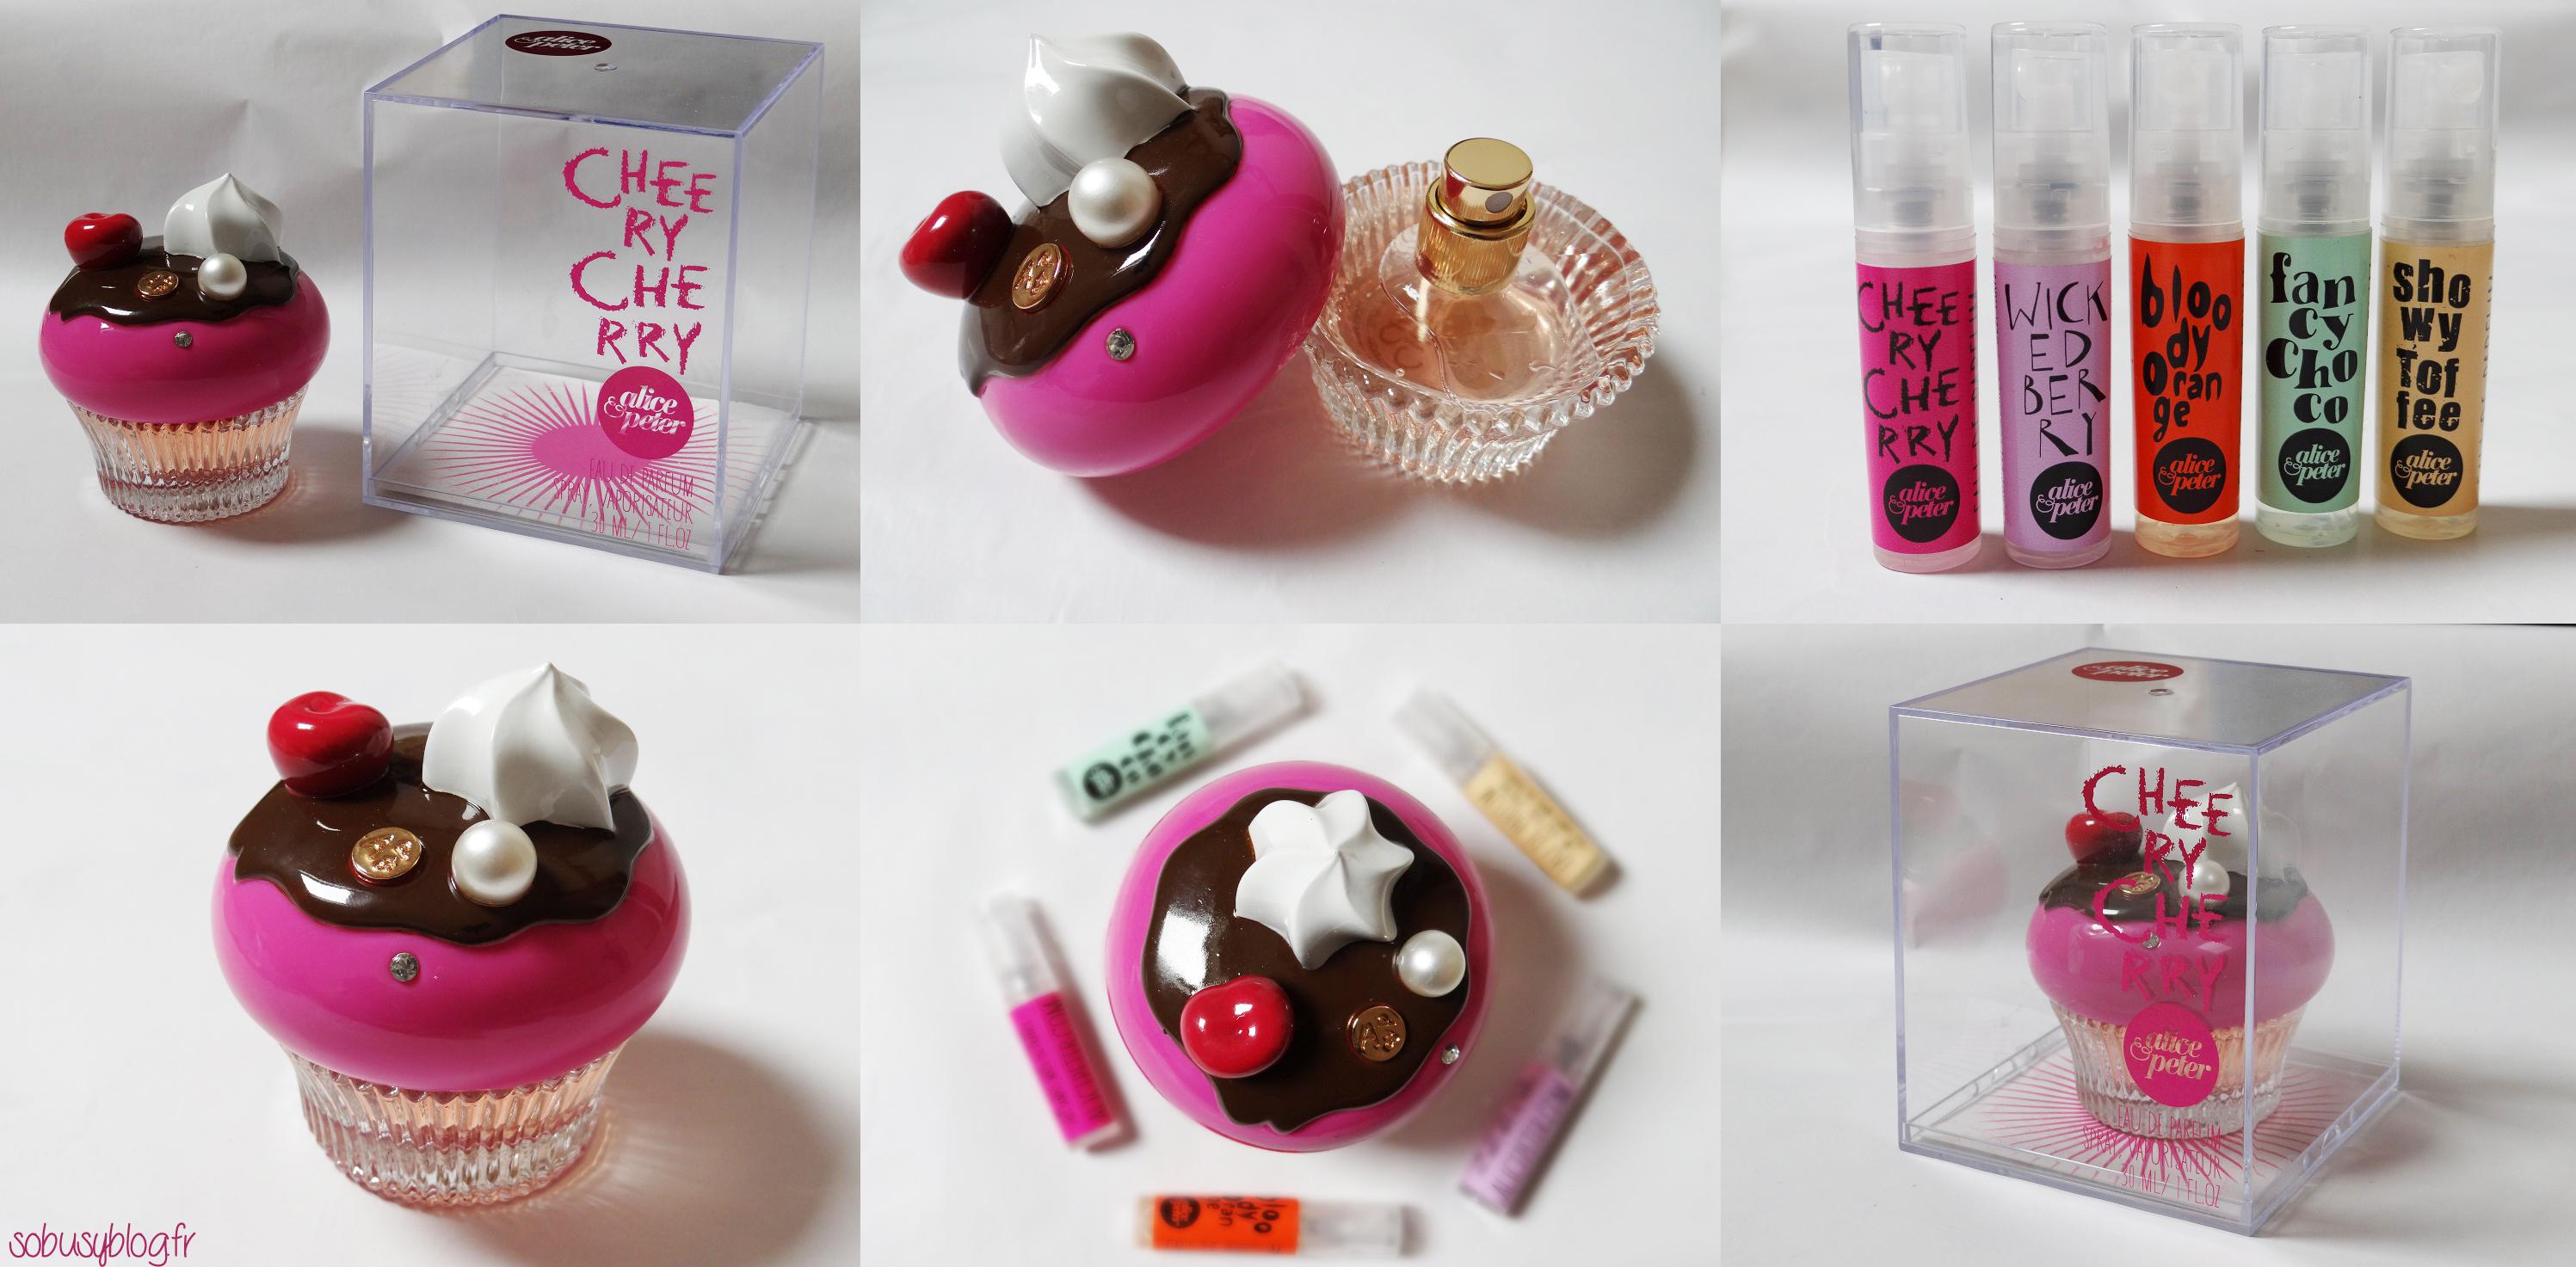 alice-et-peter-parfum-cherry-cherry-avis